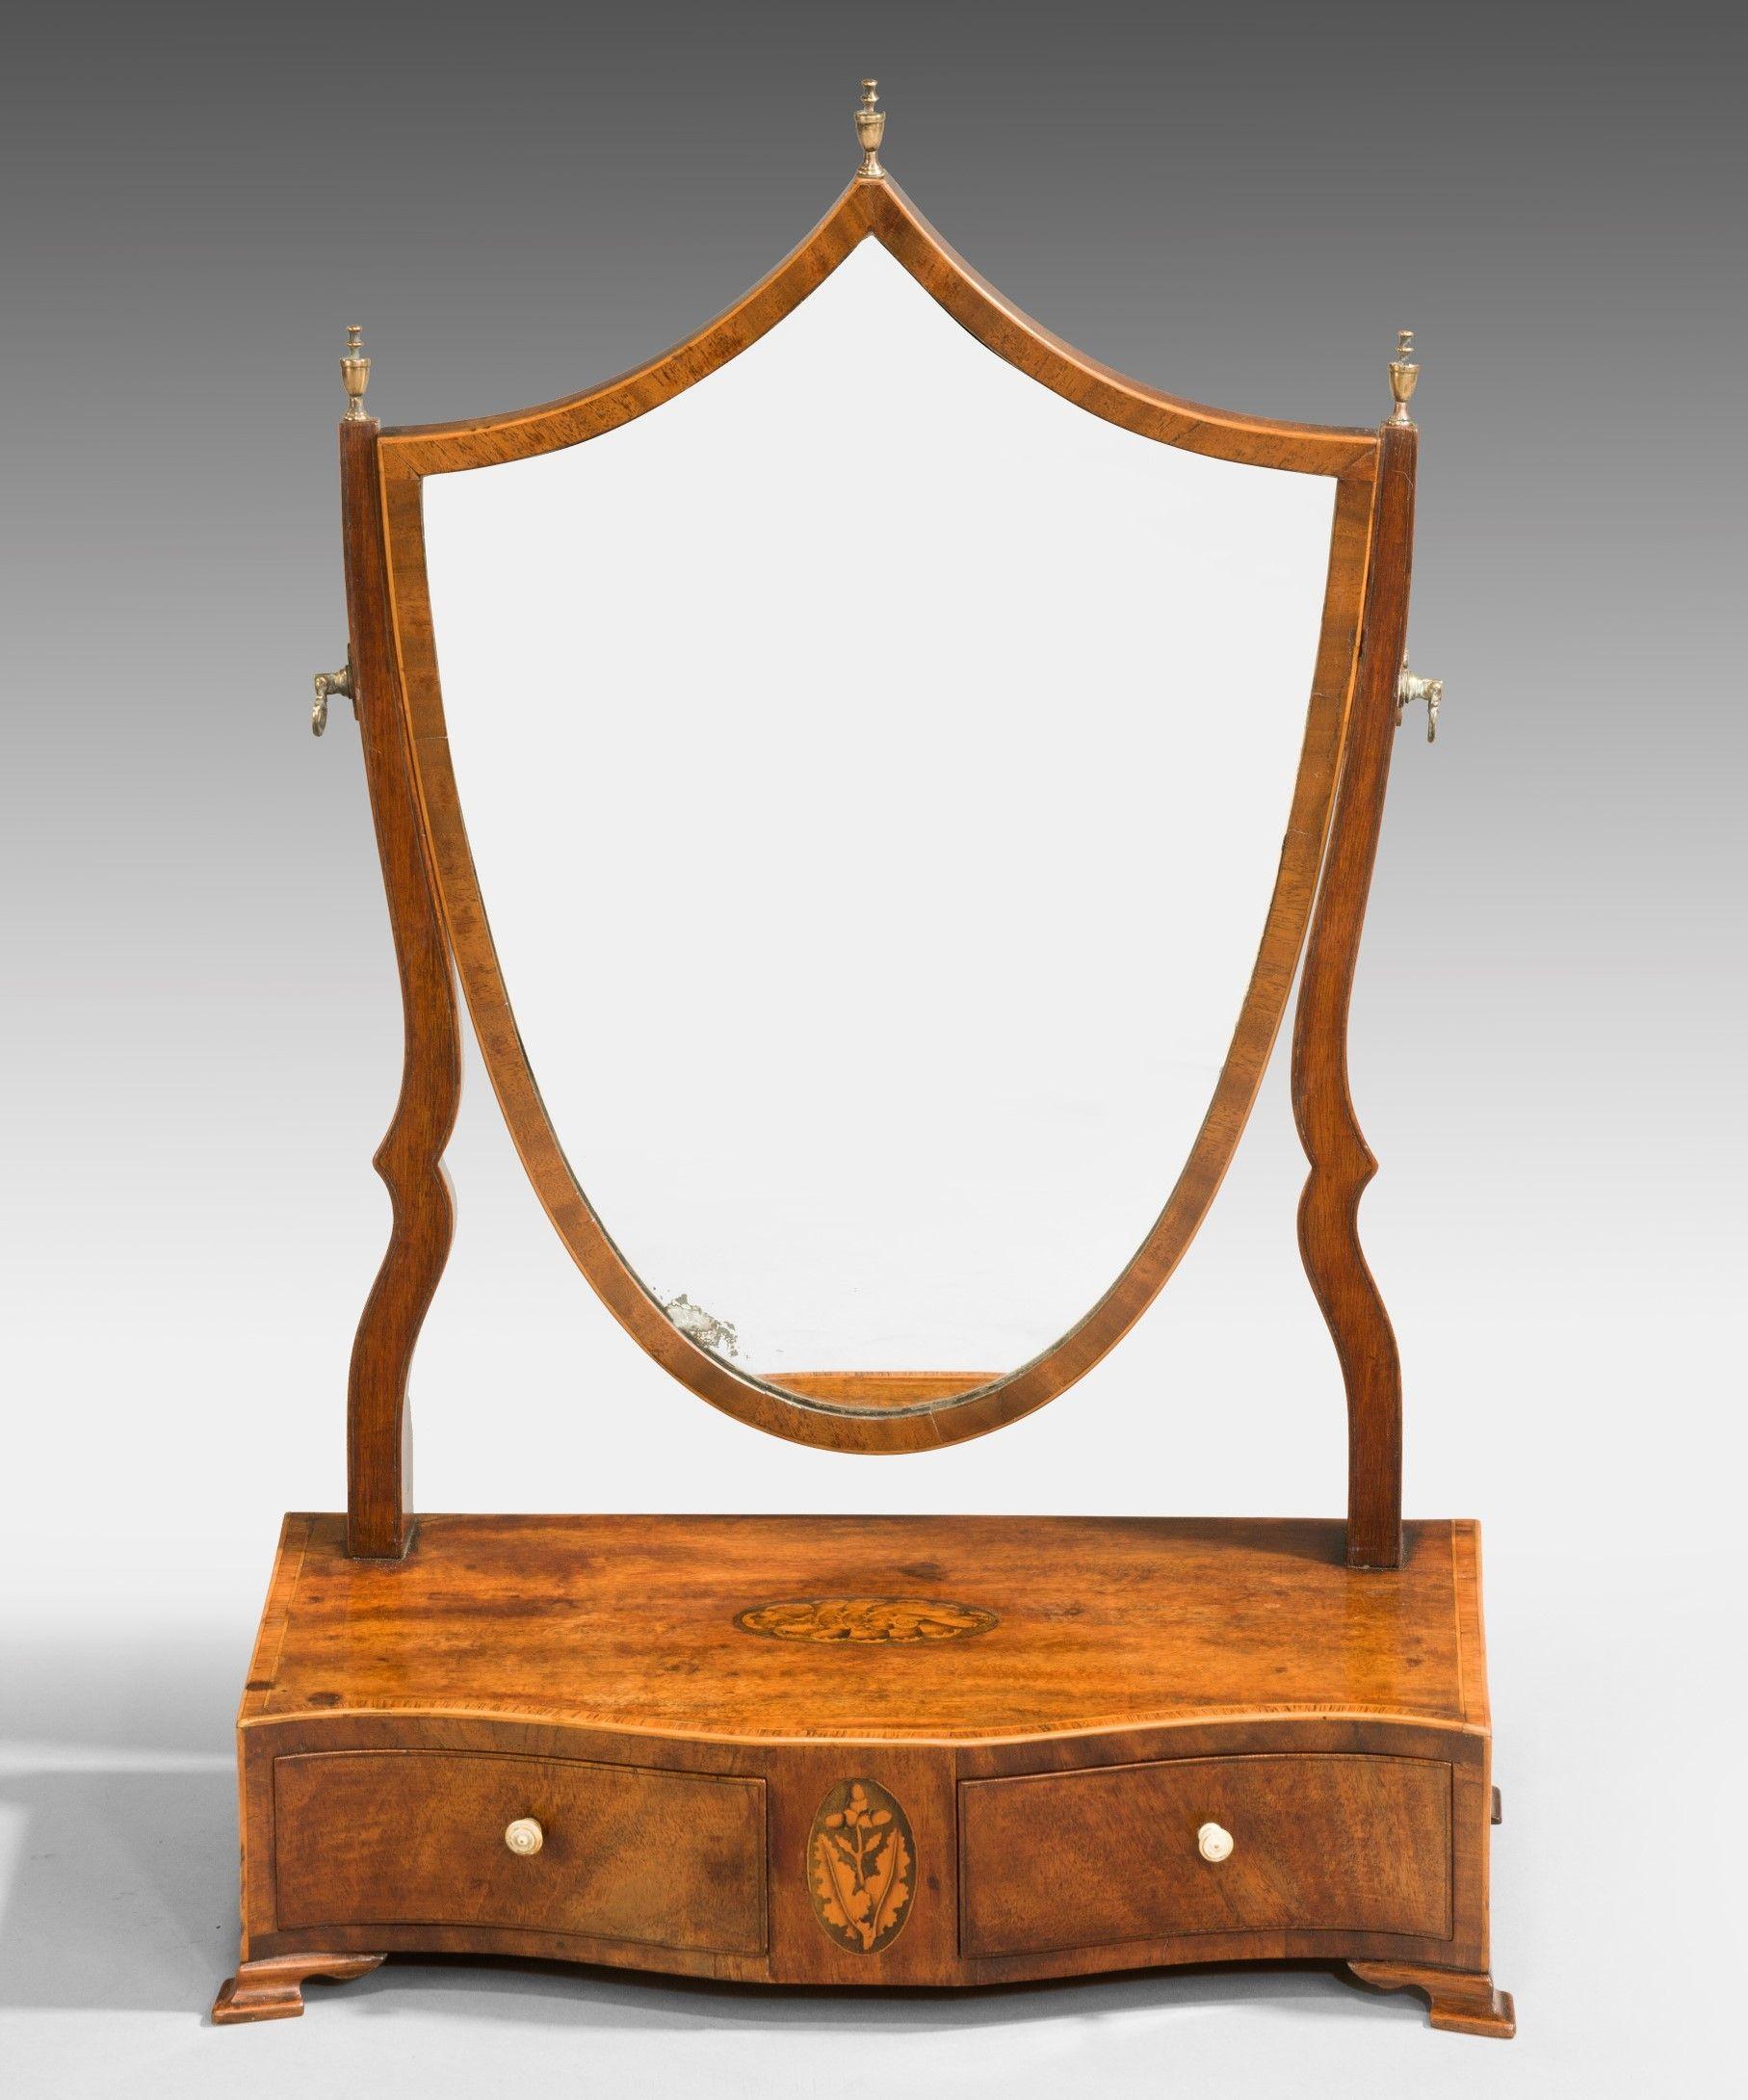 English Antique Georgian Furniture Reindeer Antiques Coiffeuses Vintage Marqueterie Toilettes